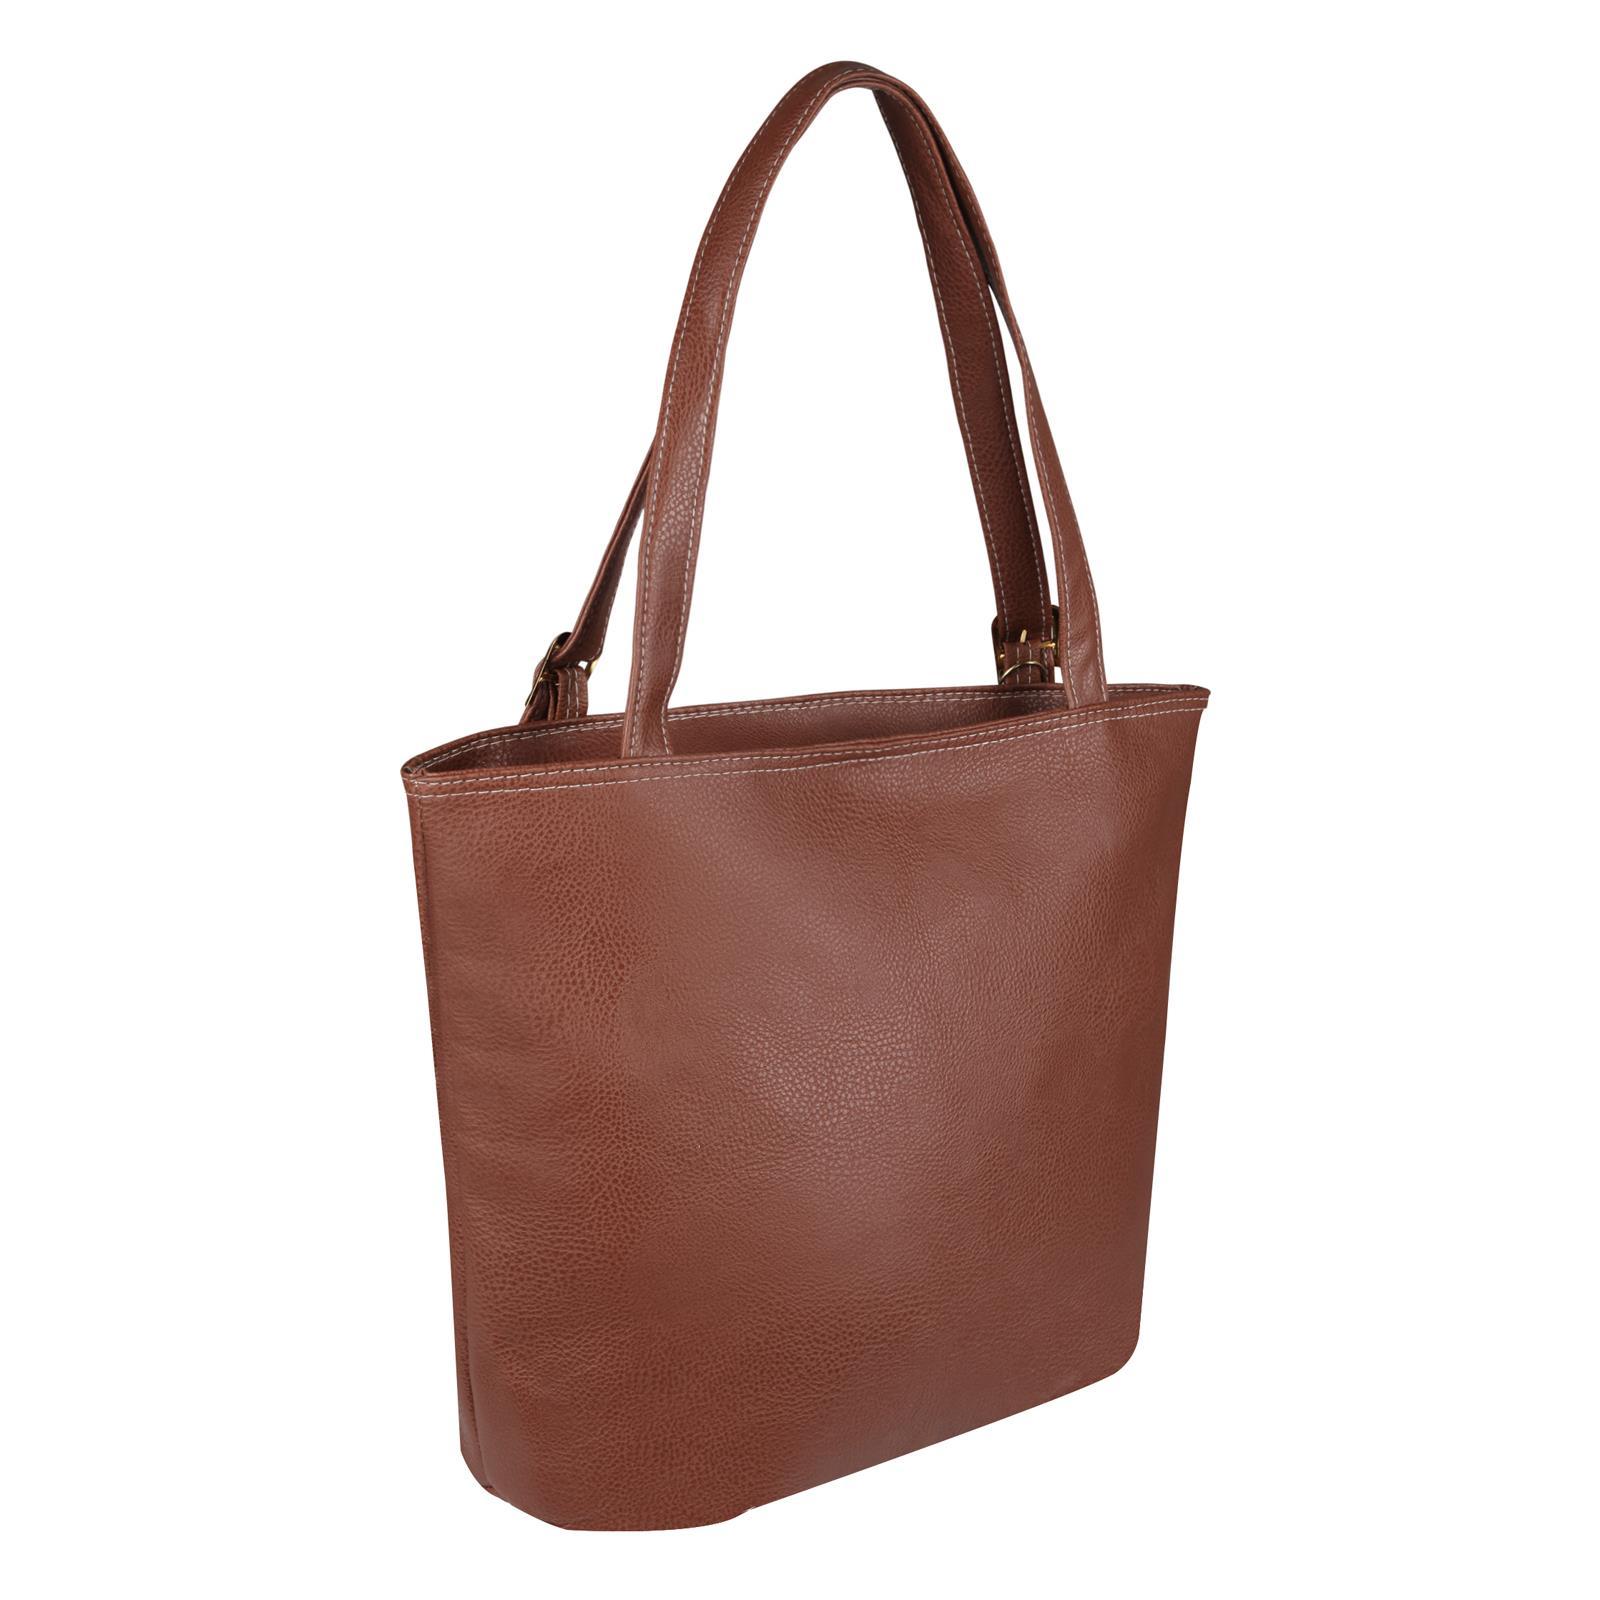 Animal-Print-Handbag-PU-Leather-Shoulder-Bag-Work-Office-Tote-Shopper-Fashion thumbnail 13